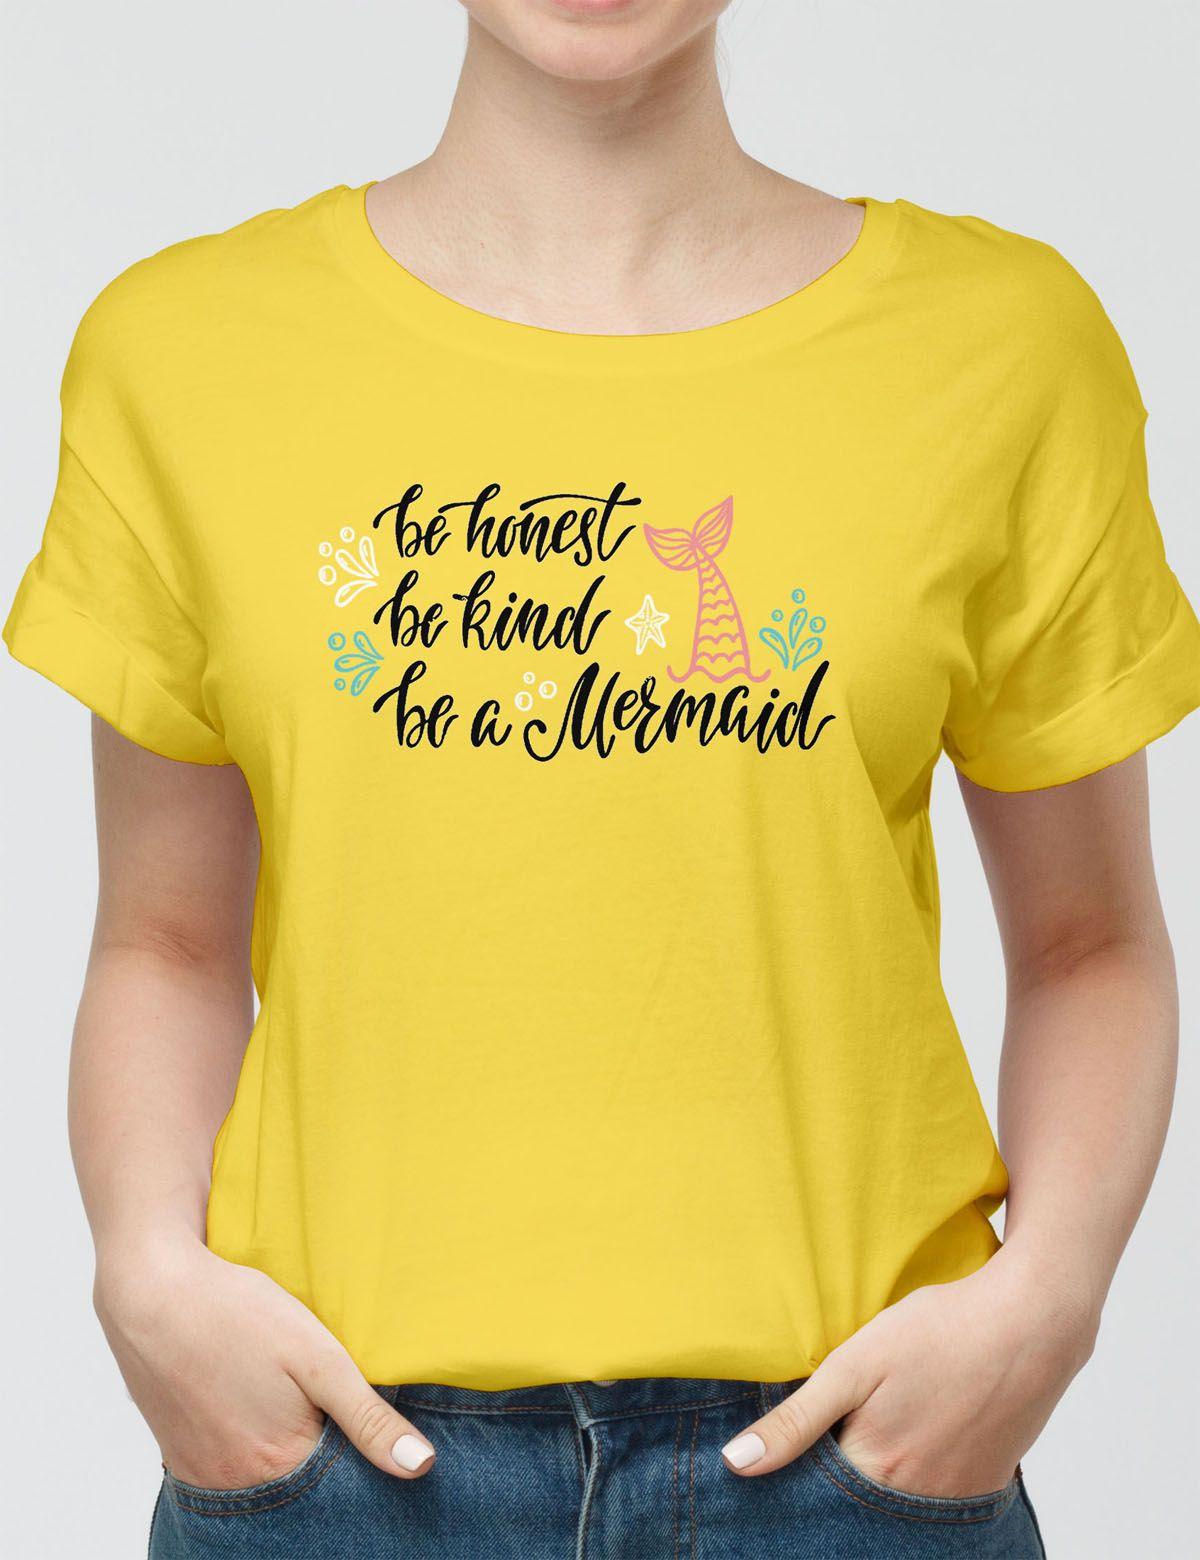 free t shirt artwork